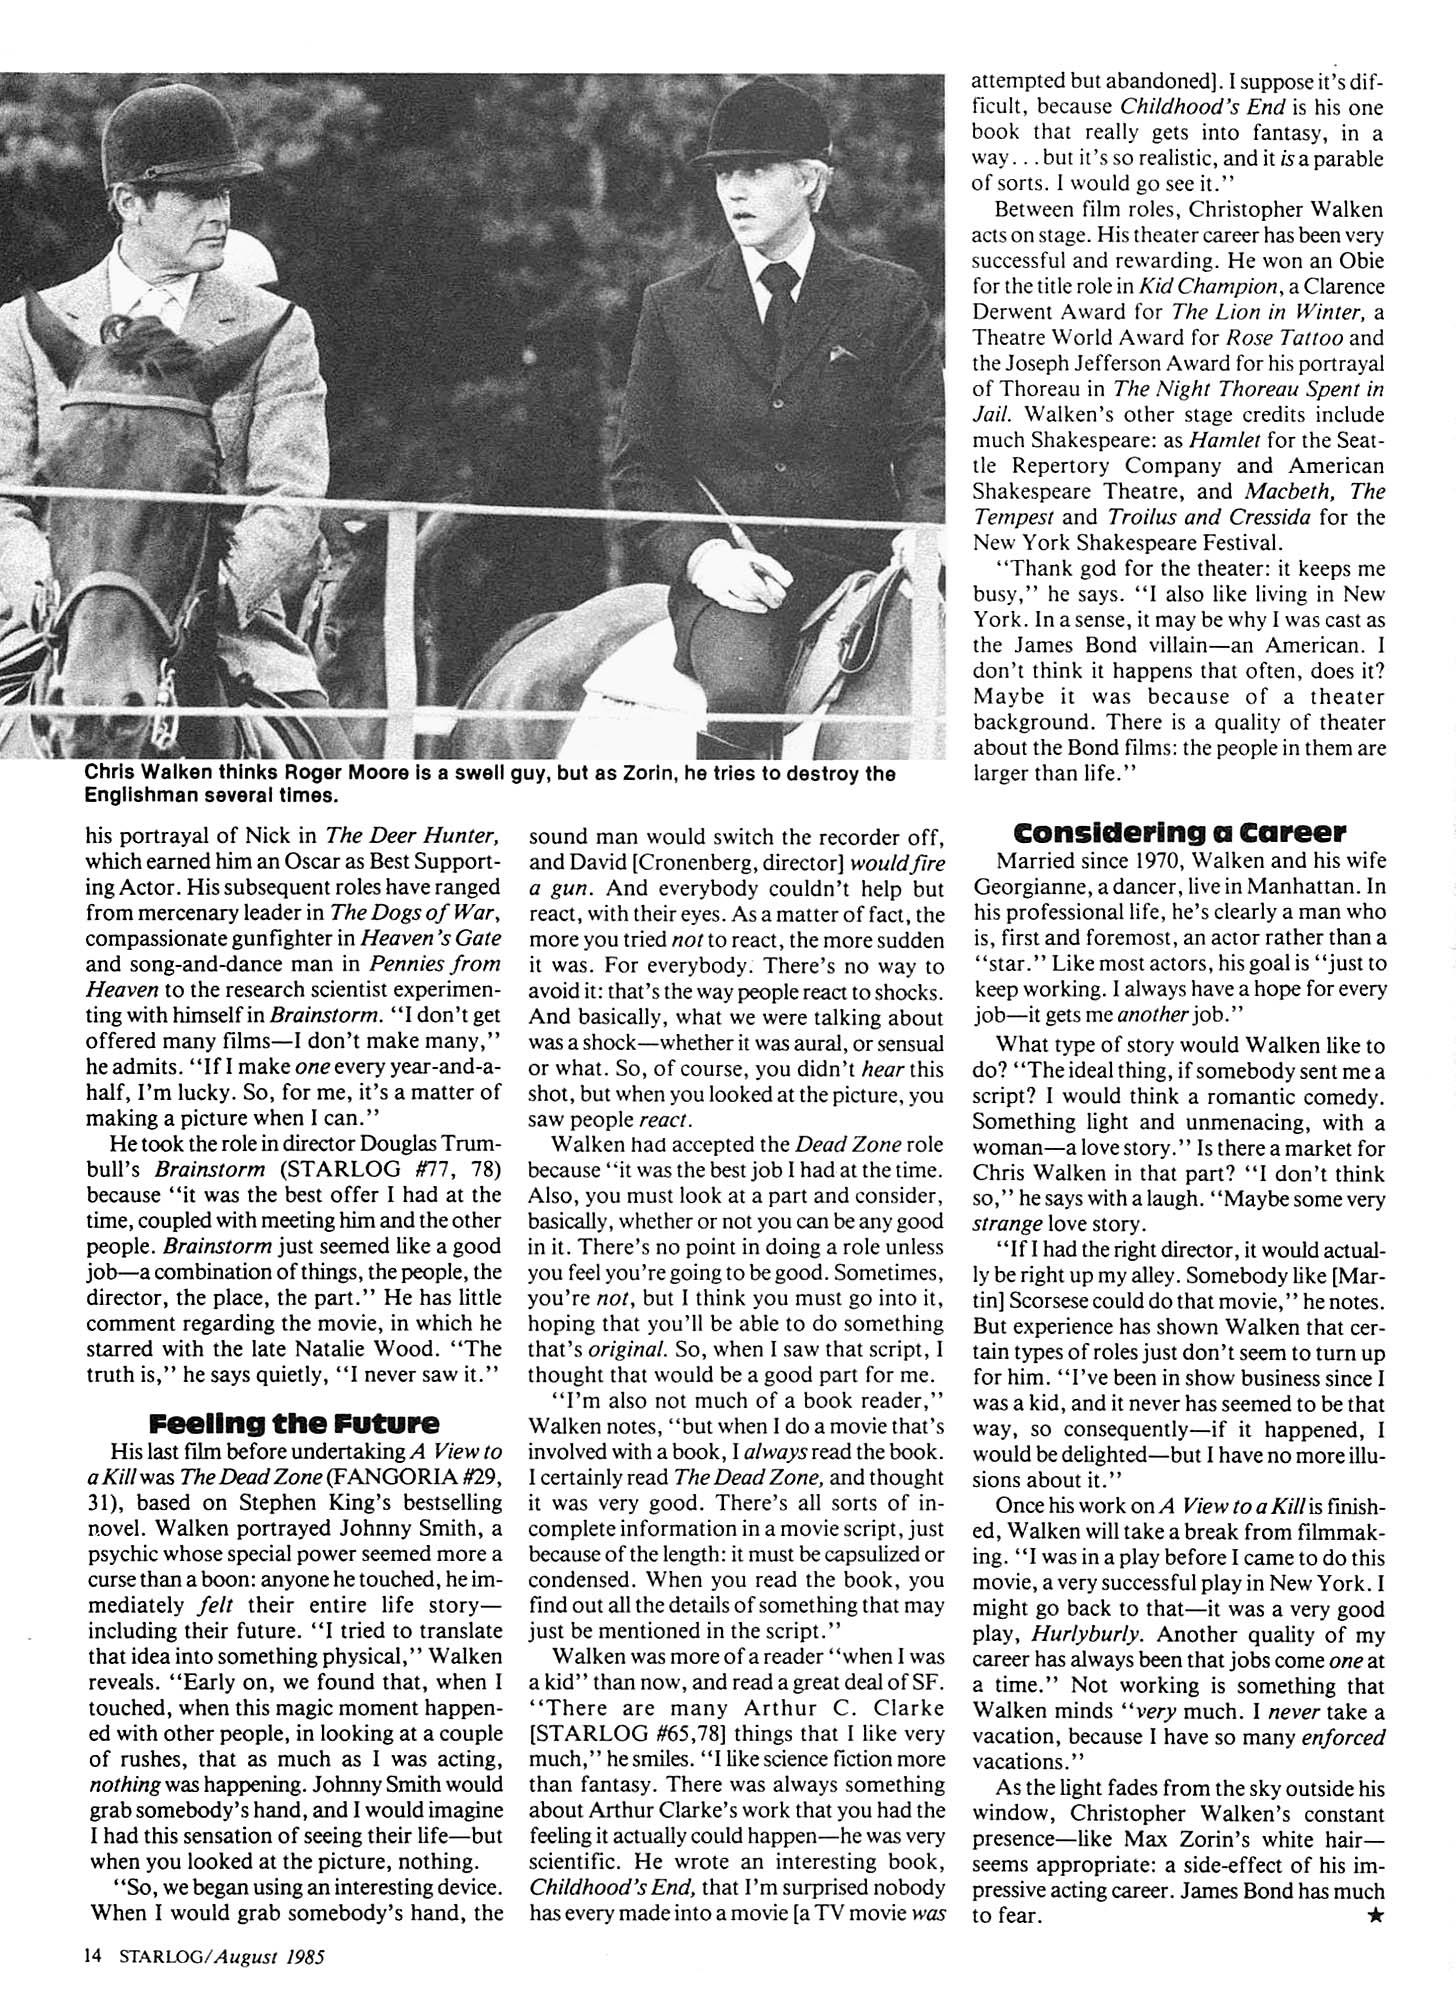 Starlog 097 1985 08 Bond-3.jpg